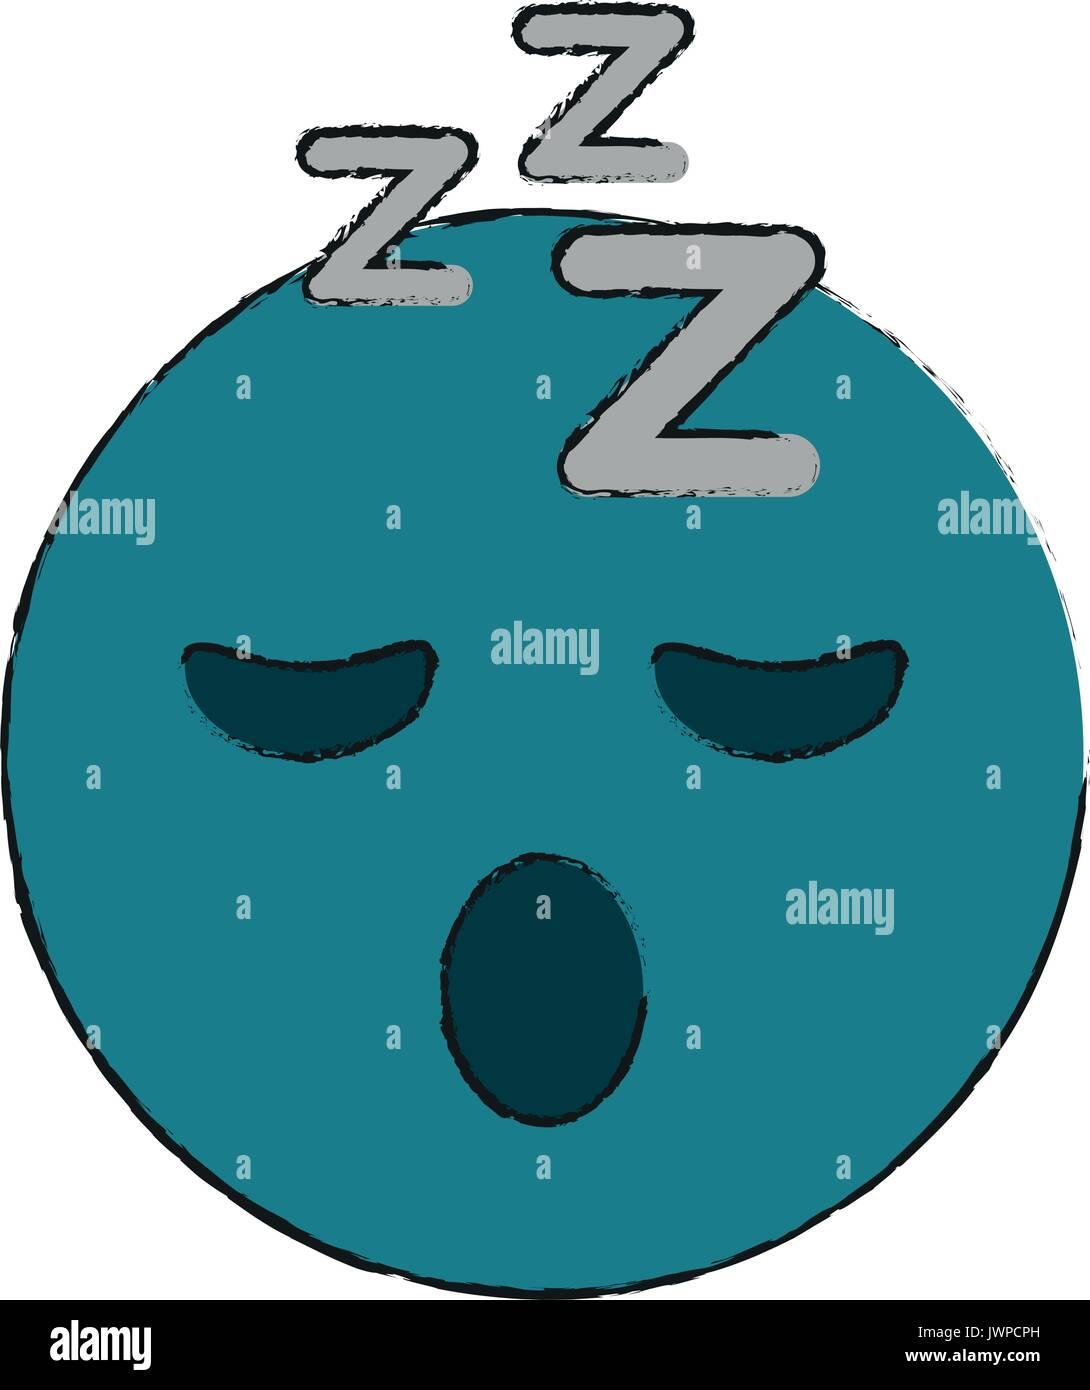 sleepy eyes zzz emoji icon image Stock Vector Art & Illustration